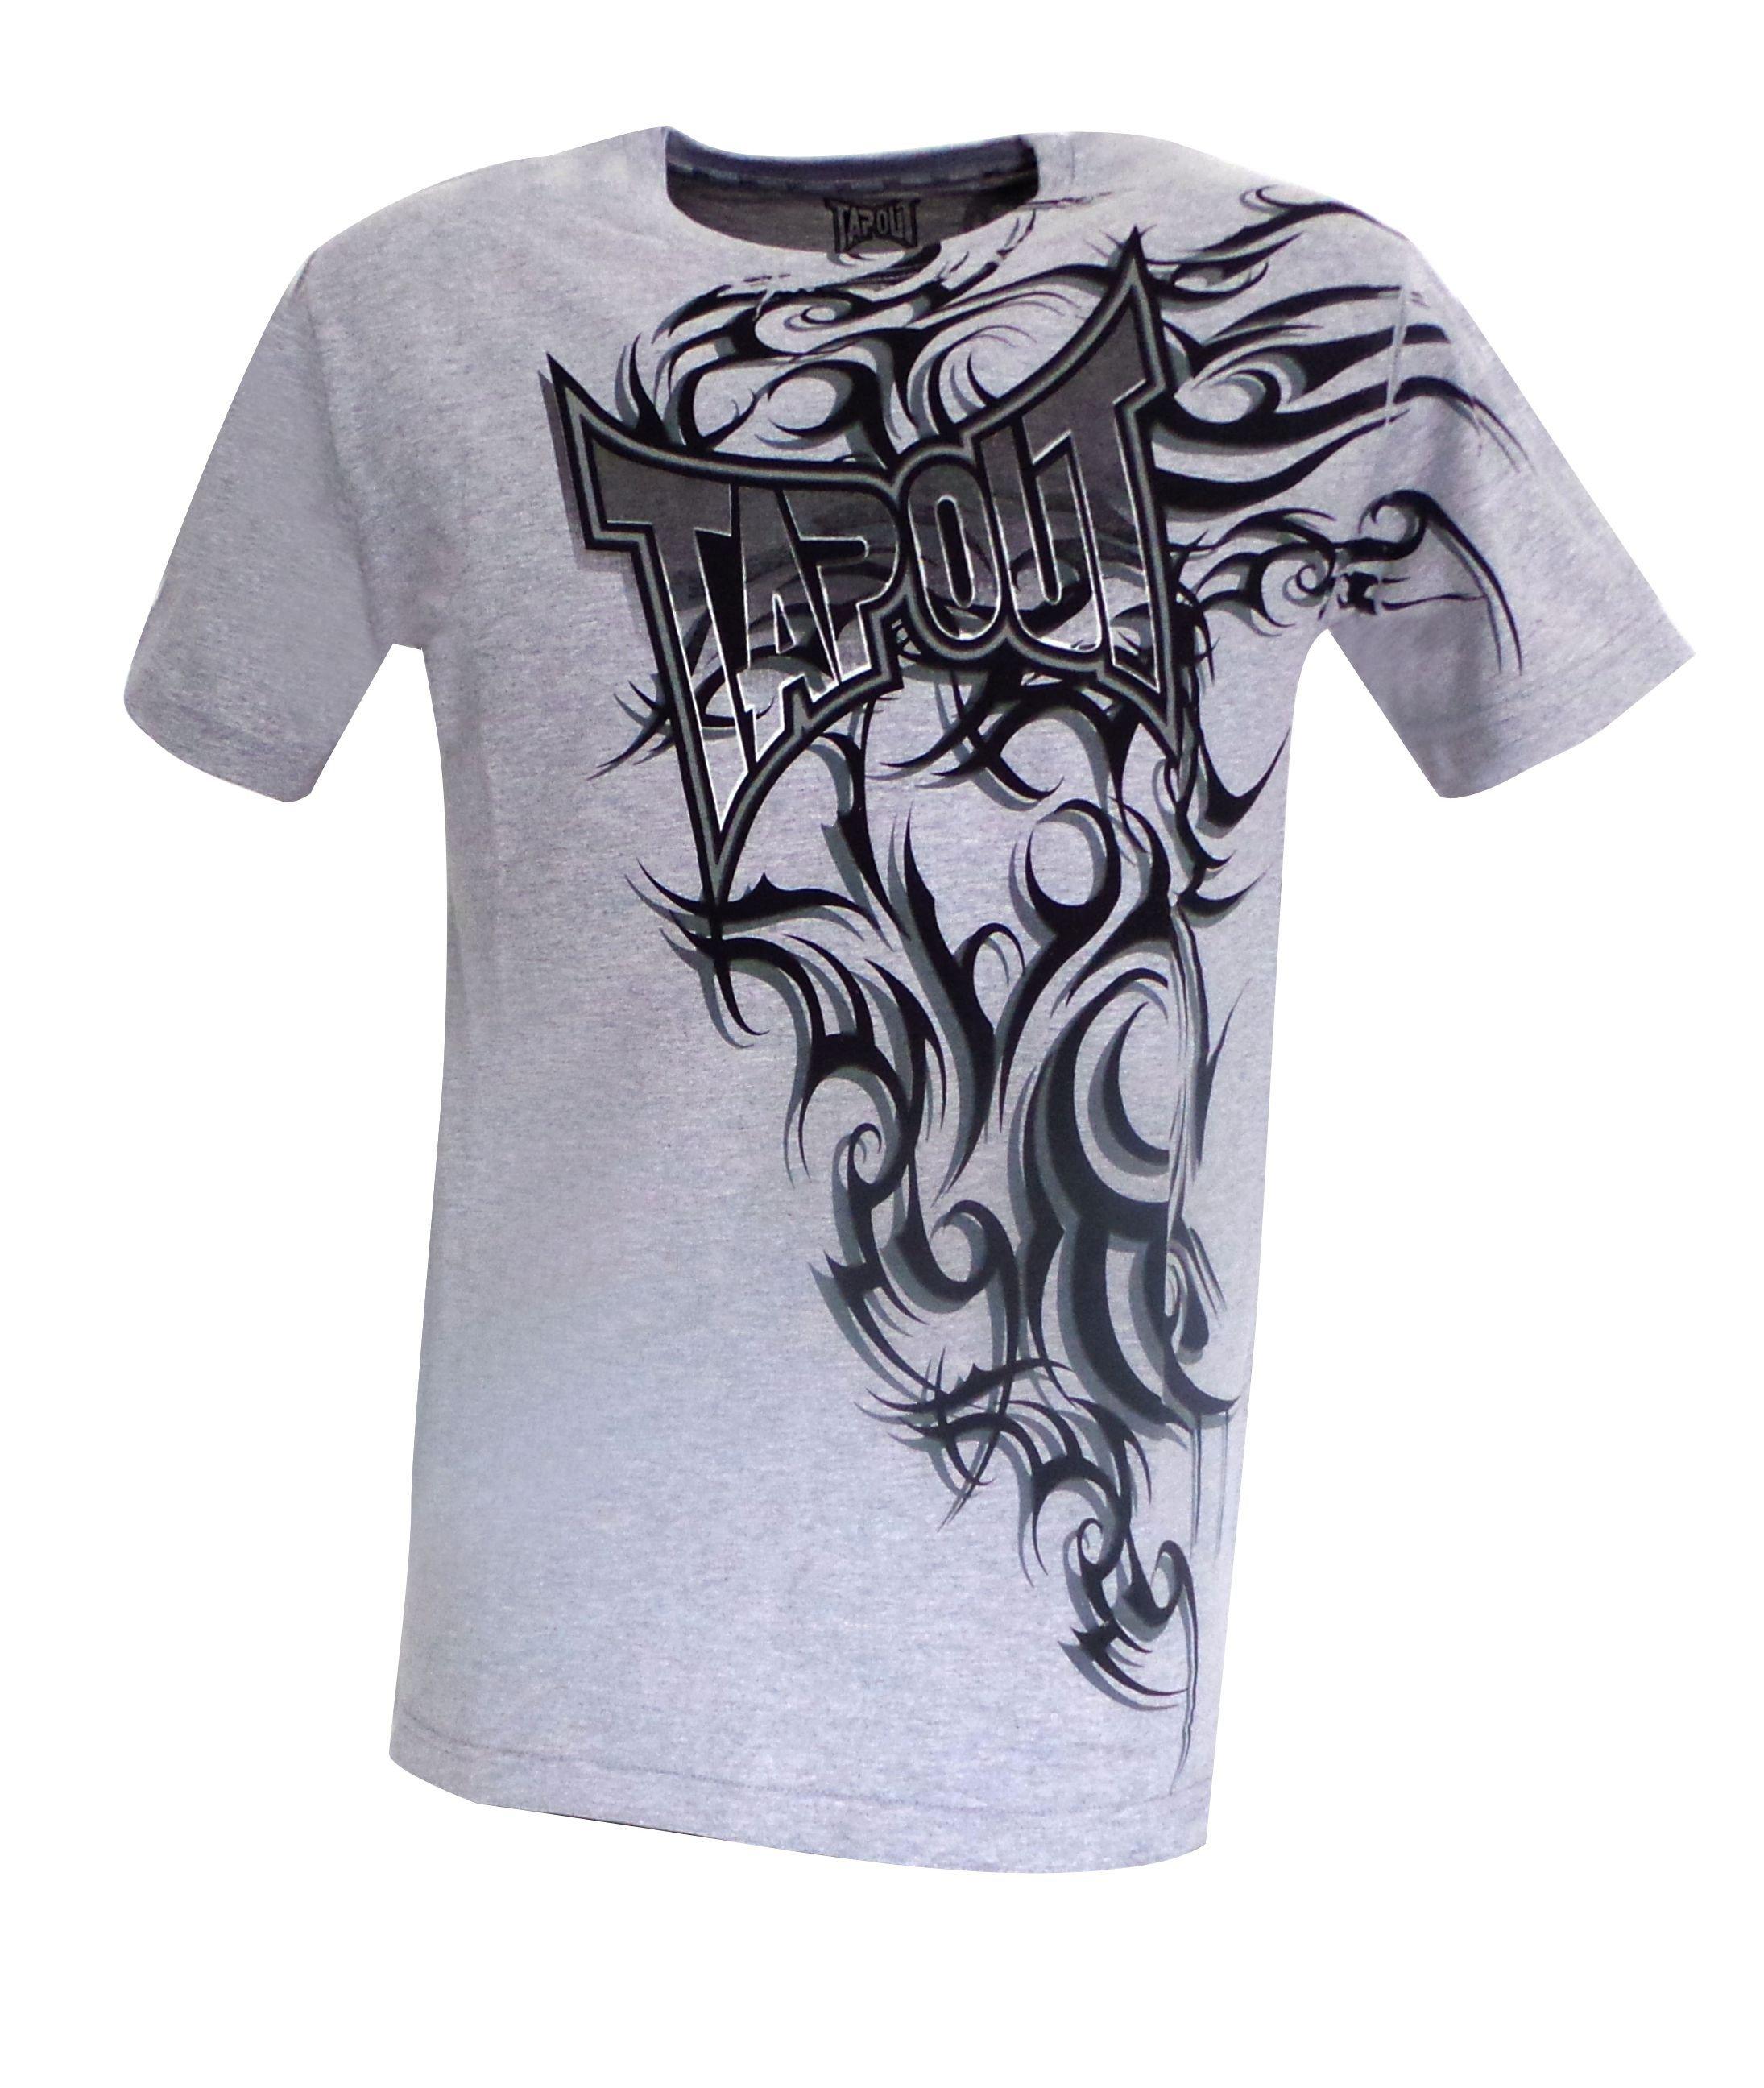 T-shirt Tapout tribal gris